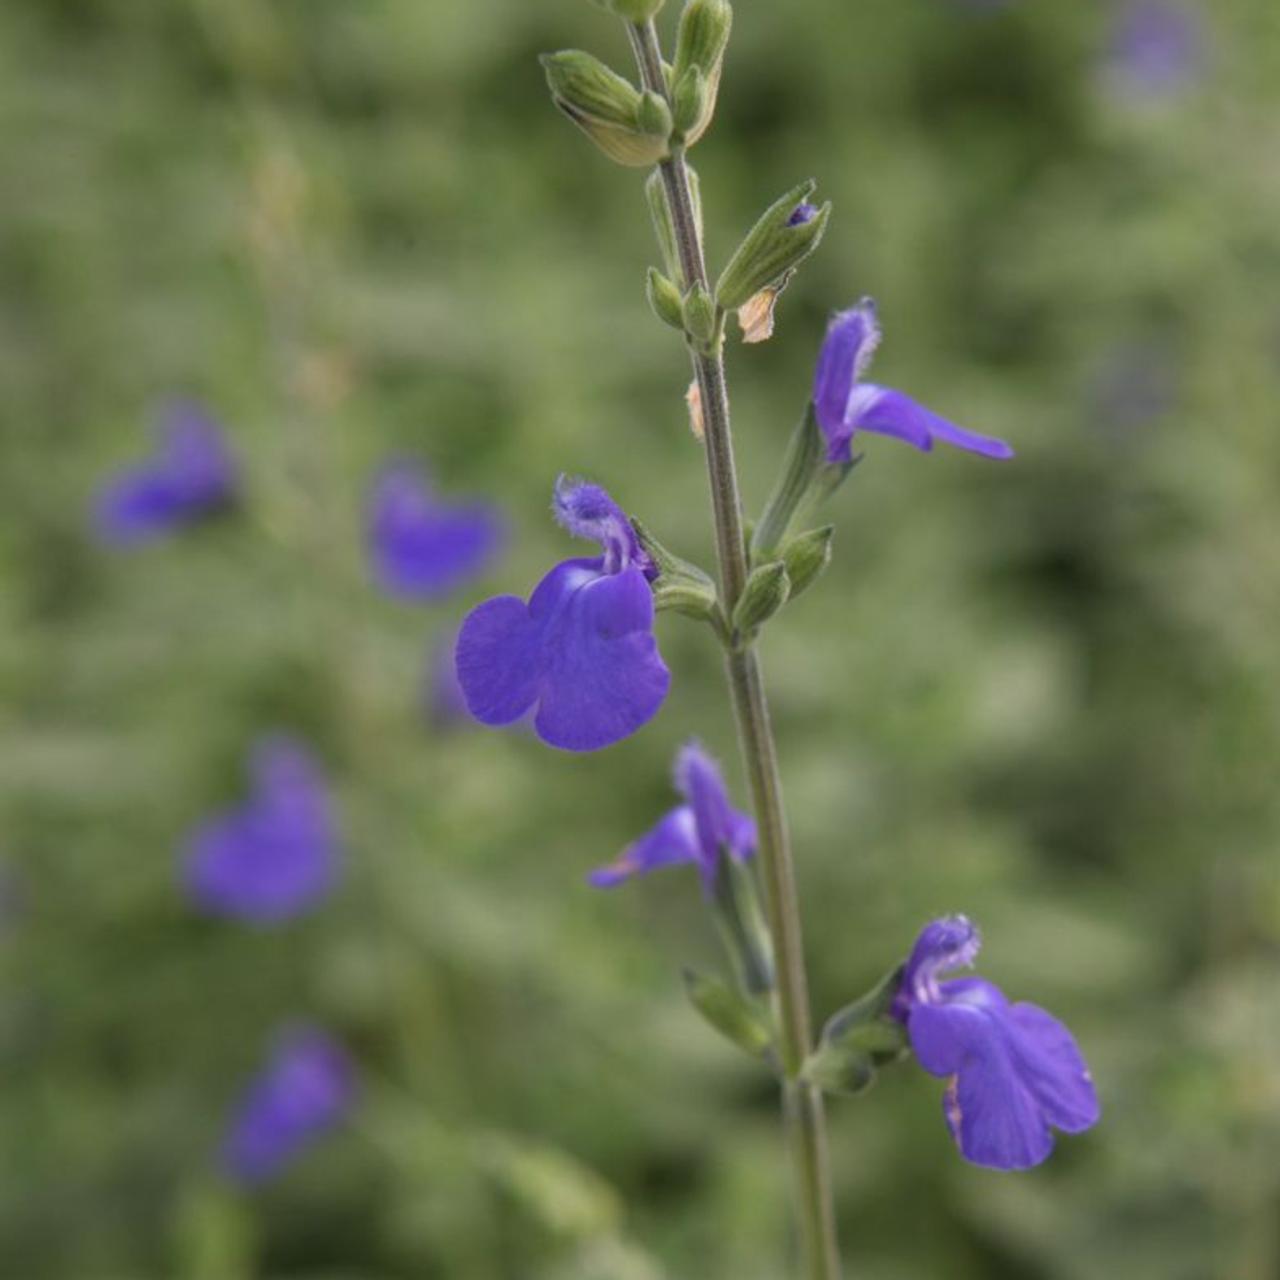 Salvia microphylla 'Blue Monrovia' plant